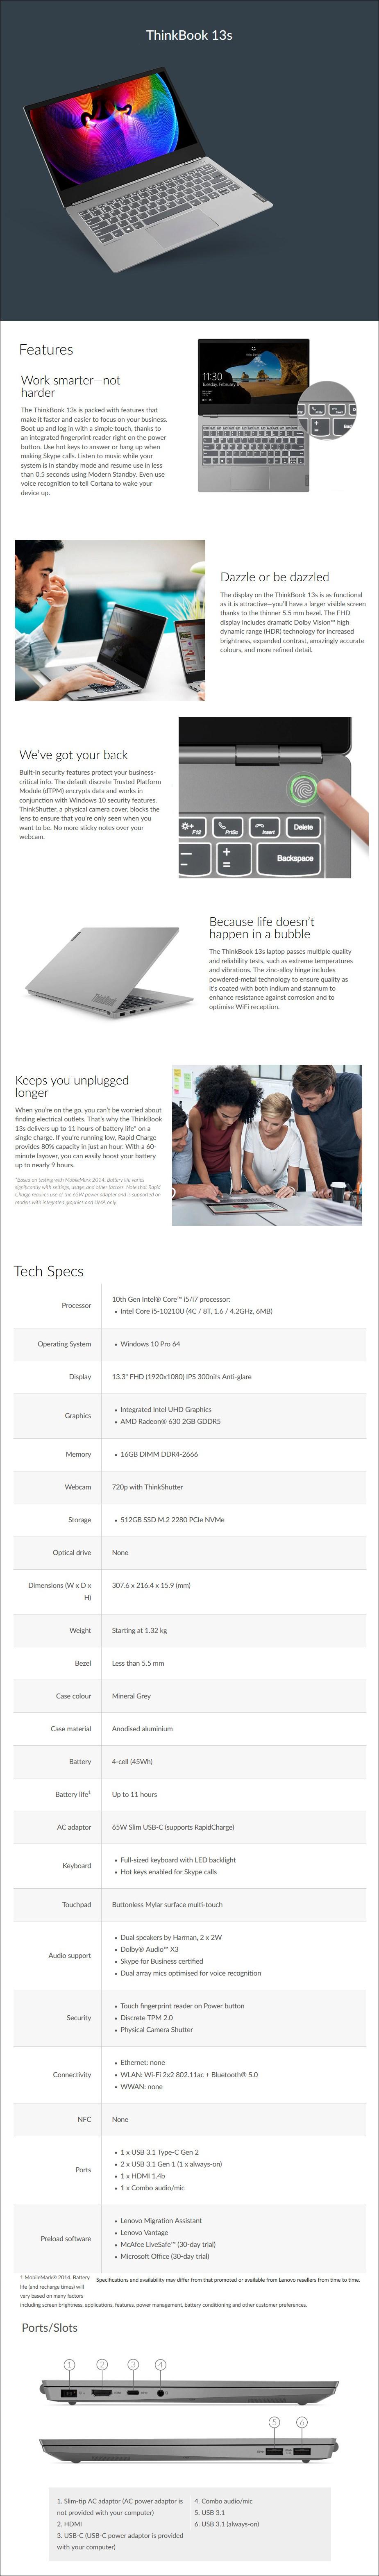 "Lenovo ThinkBook 13s 13.3"" Laptop i5-10210U 16GB 512GB SSD W10P - Overview 1"